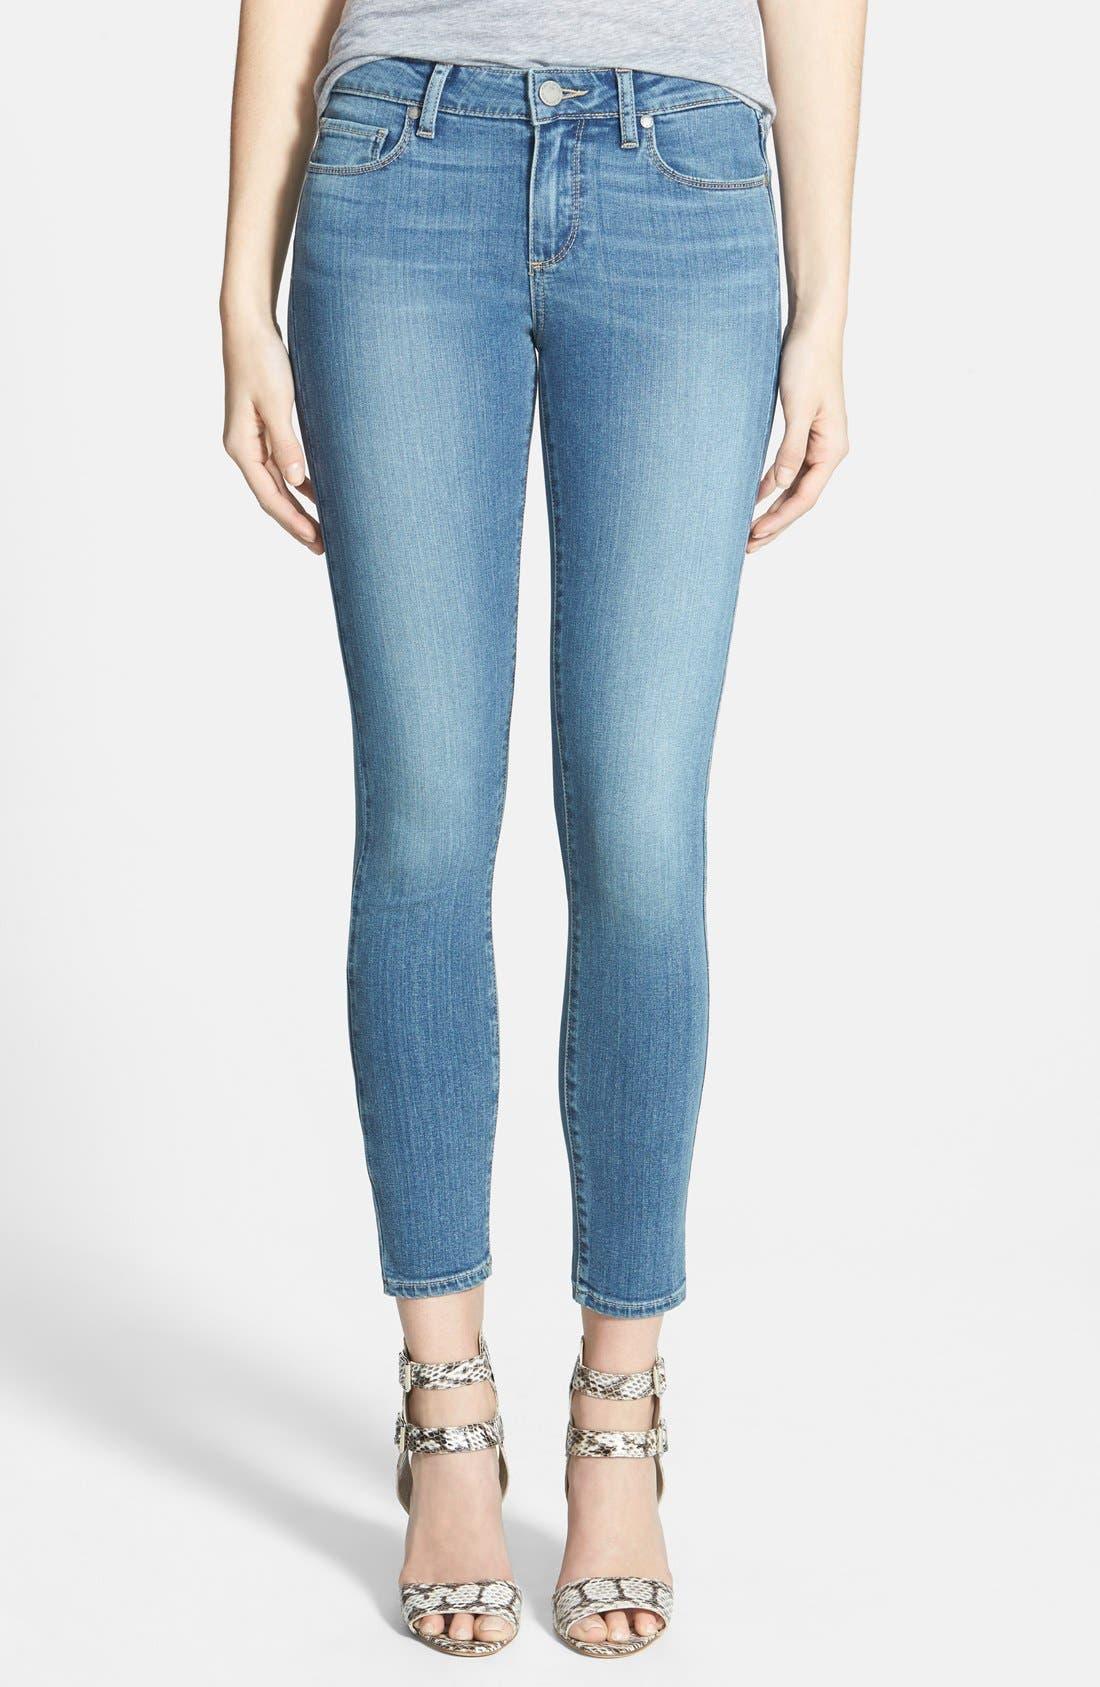 Main Image - Paige Denim 'Verdugo' Ankle Skinny Jeans (Tegan)